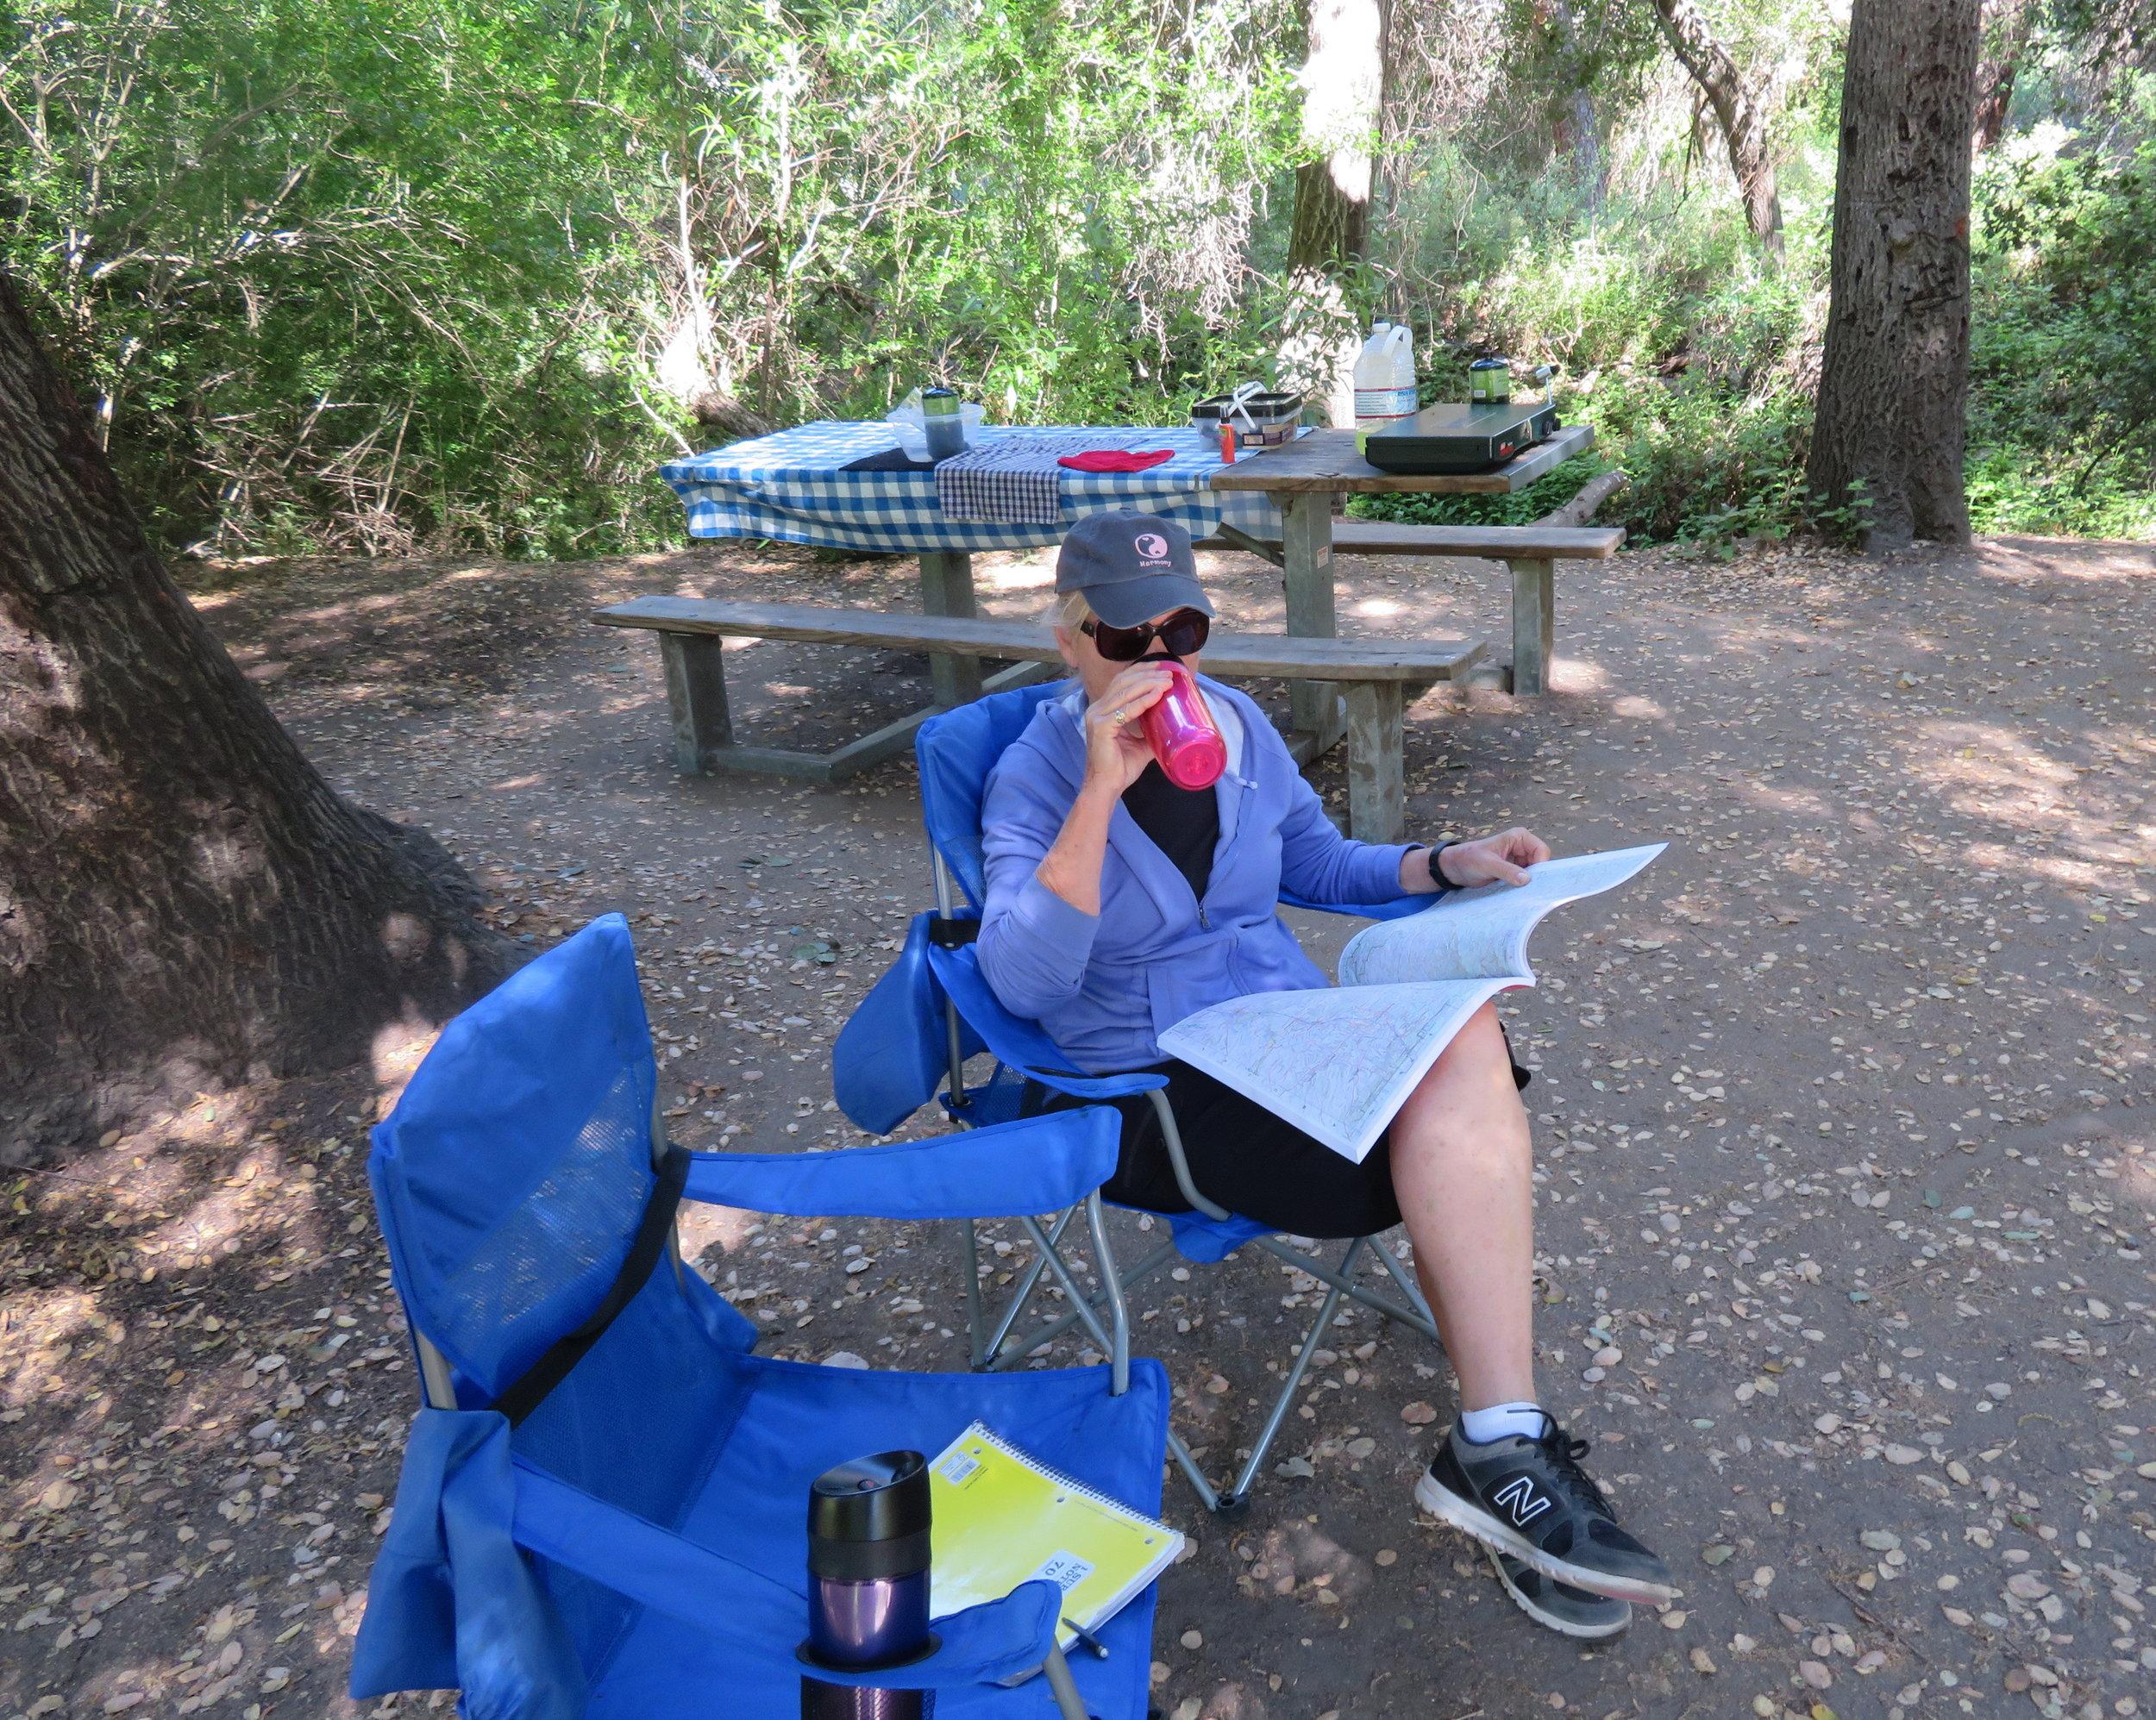 creaturecomforts_morning joe at the campground.JPG